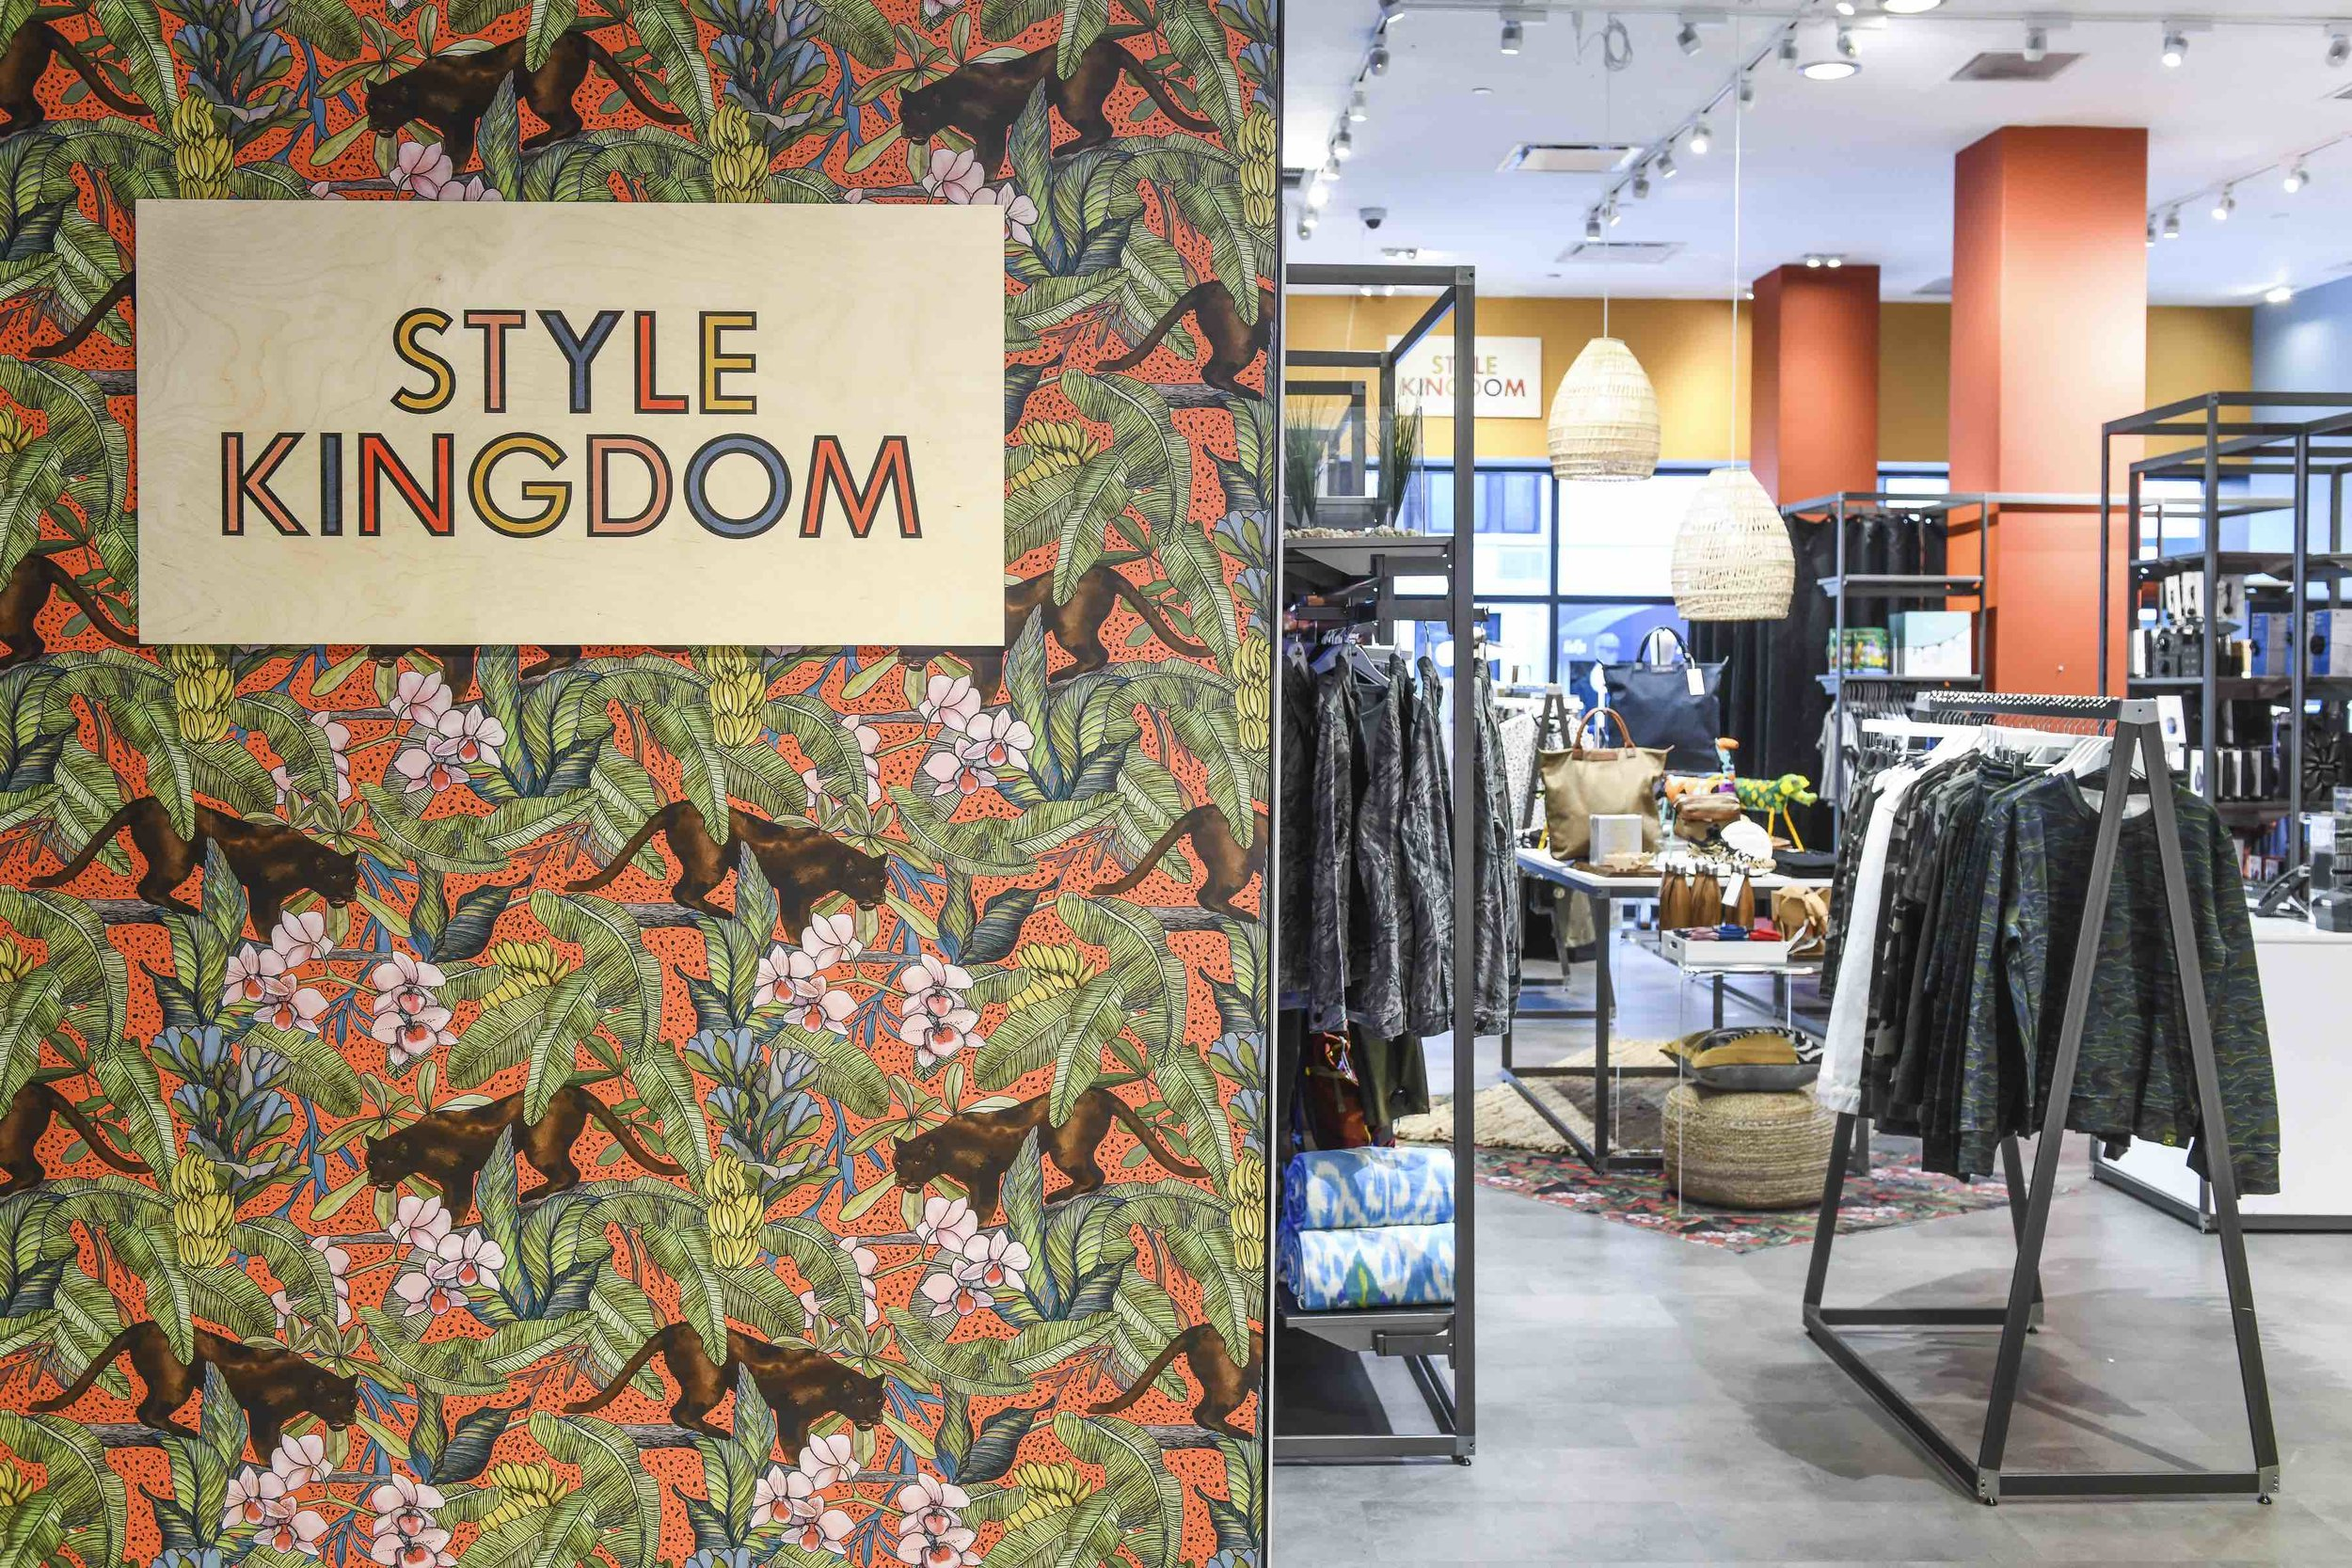 Style-Kingdom-12.jpg